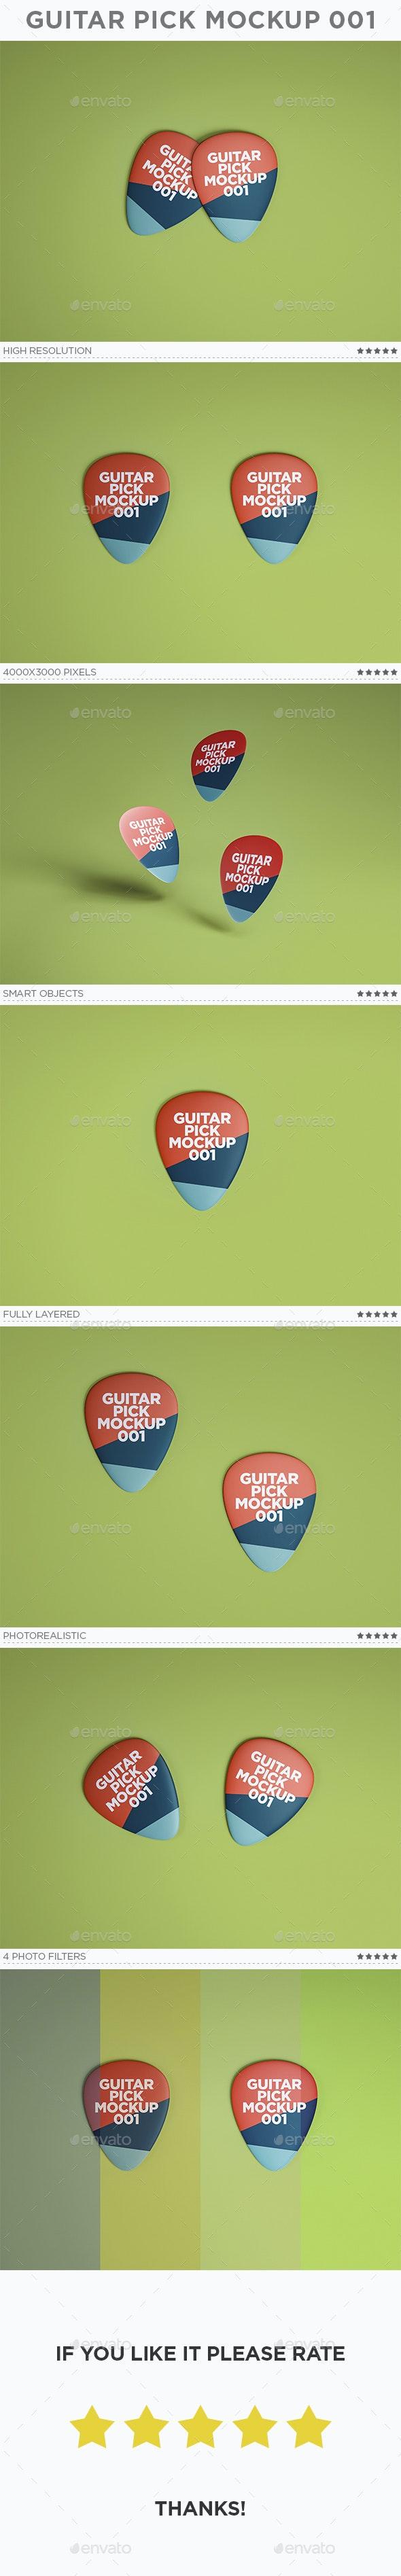 Guitar Pick Mockup 001 - Miscellaneous Product Mock-Ups